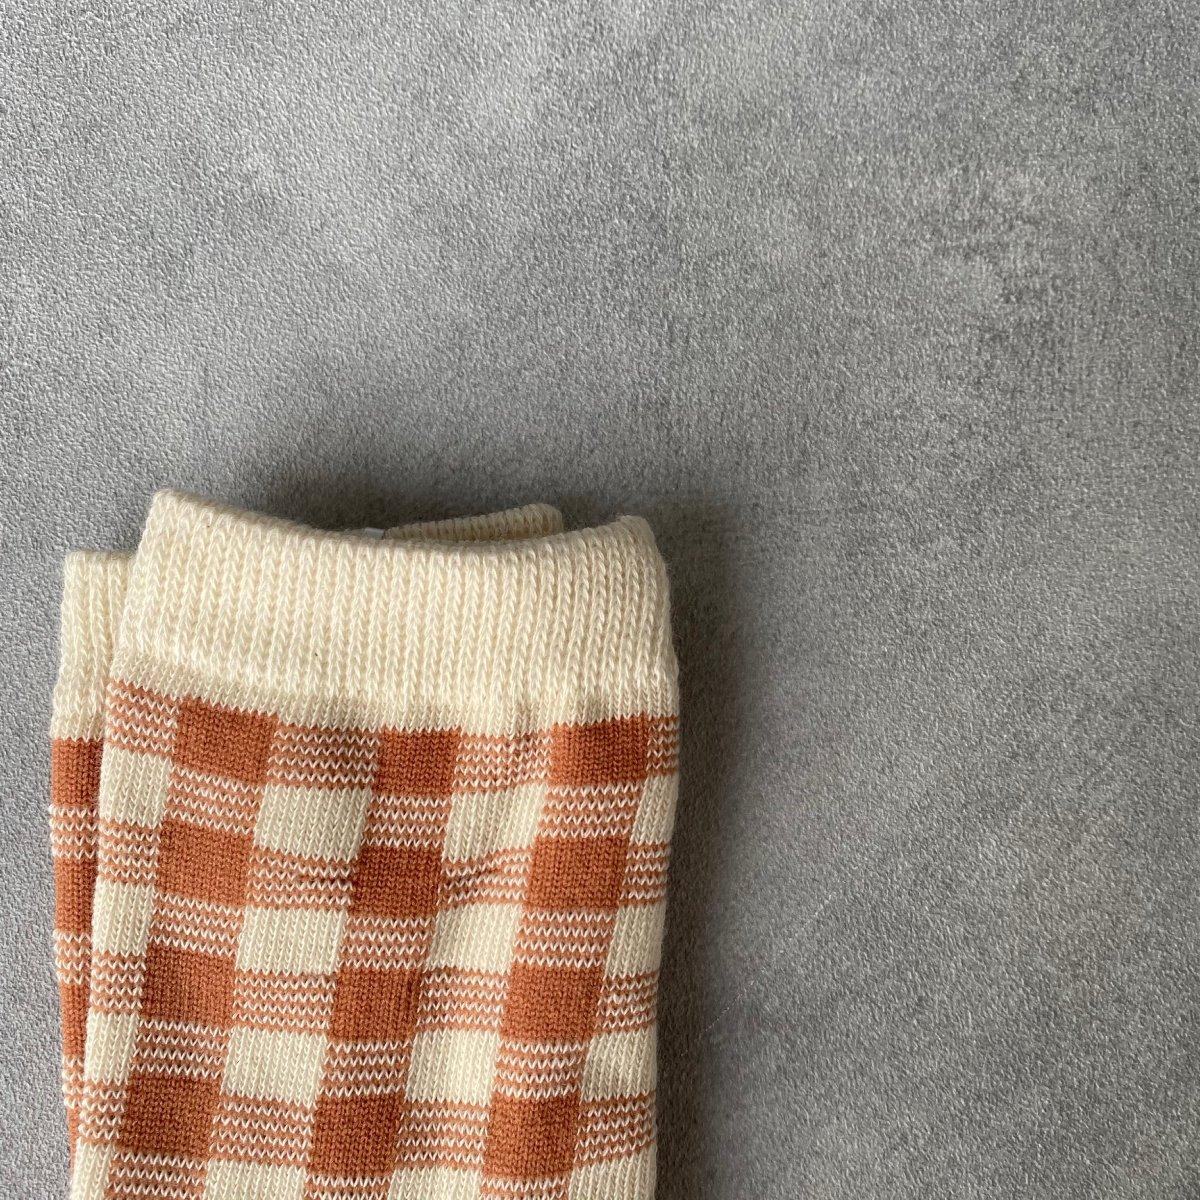 【BABY】Natural Check Socks 詳細画像15